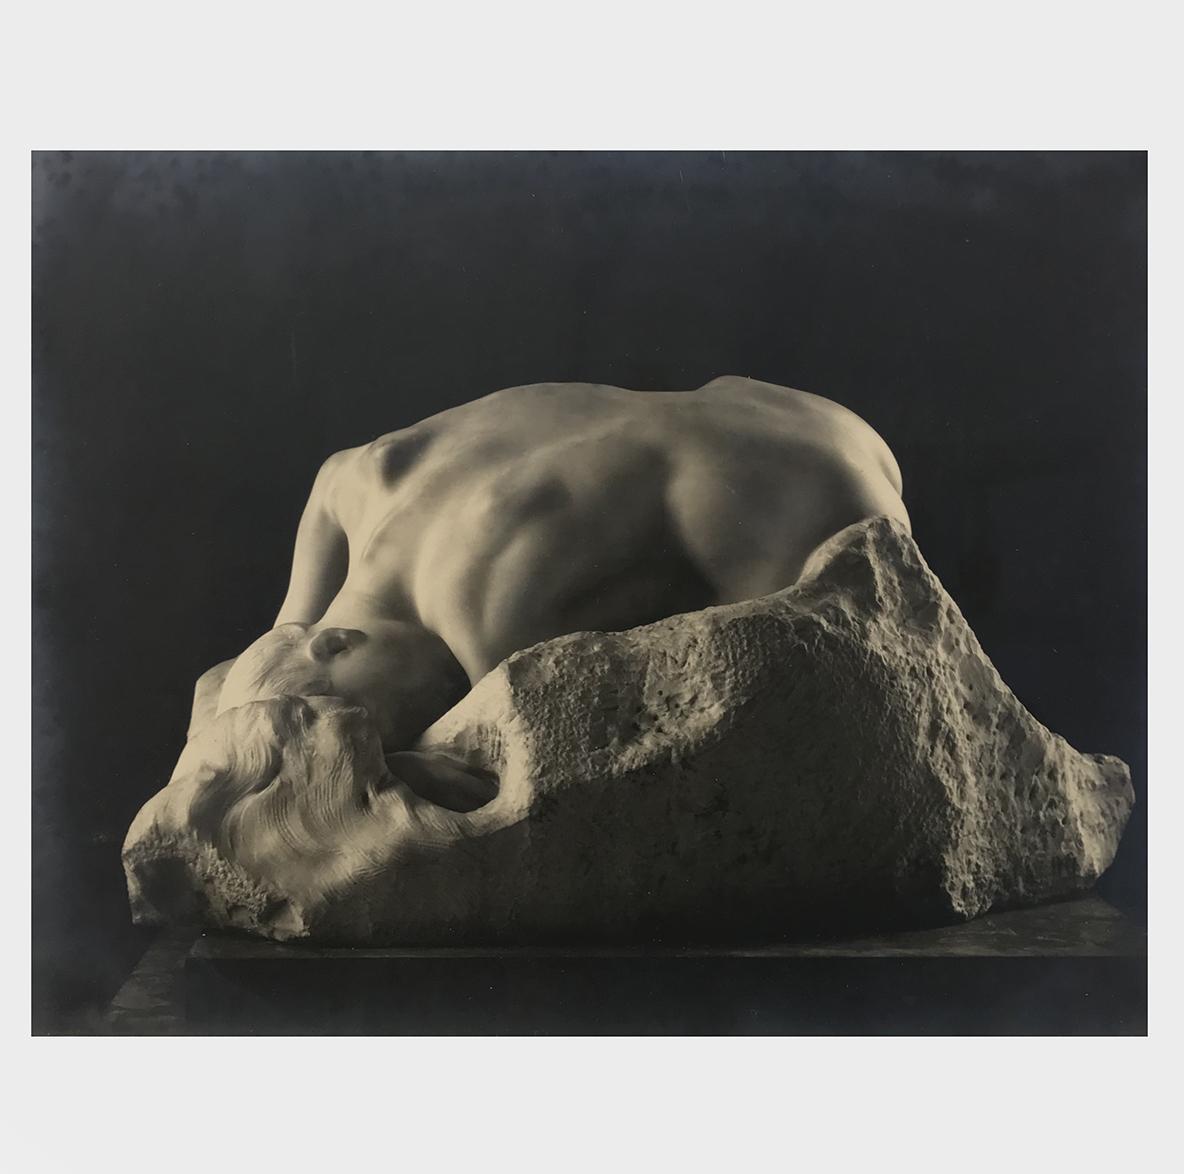 Adolphe Braun | Danaïde | Photograpy, carbon print | France | about 1885 | basedonart gallery